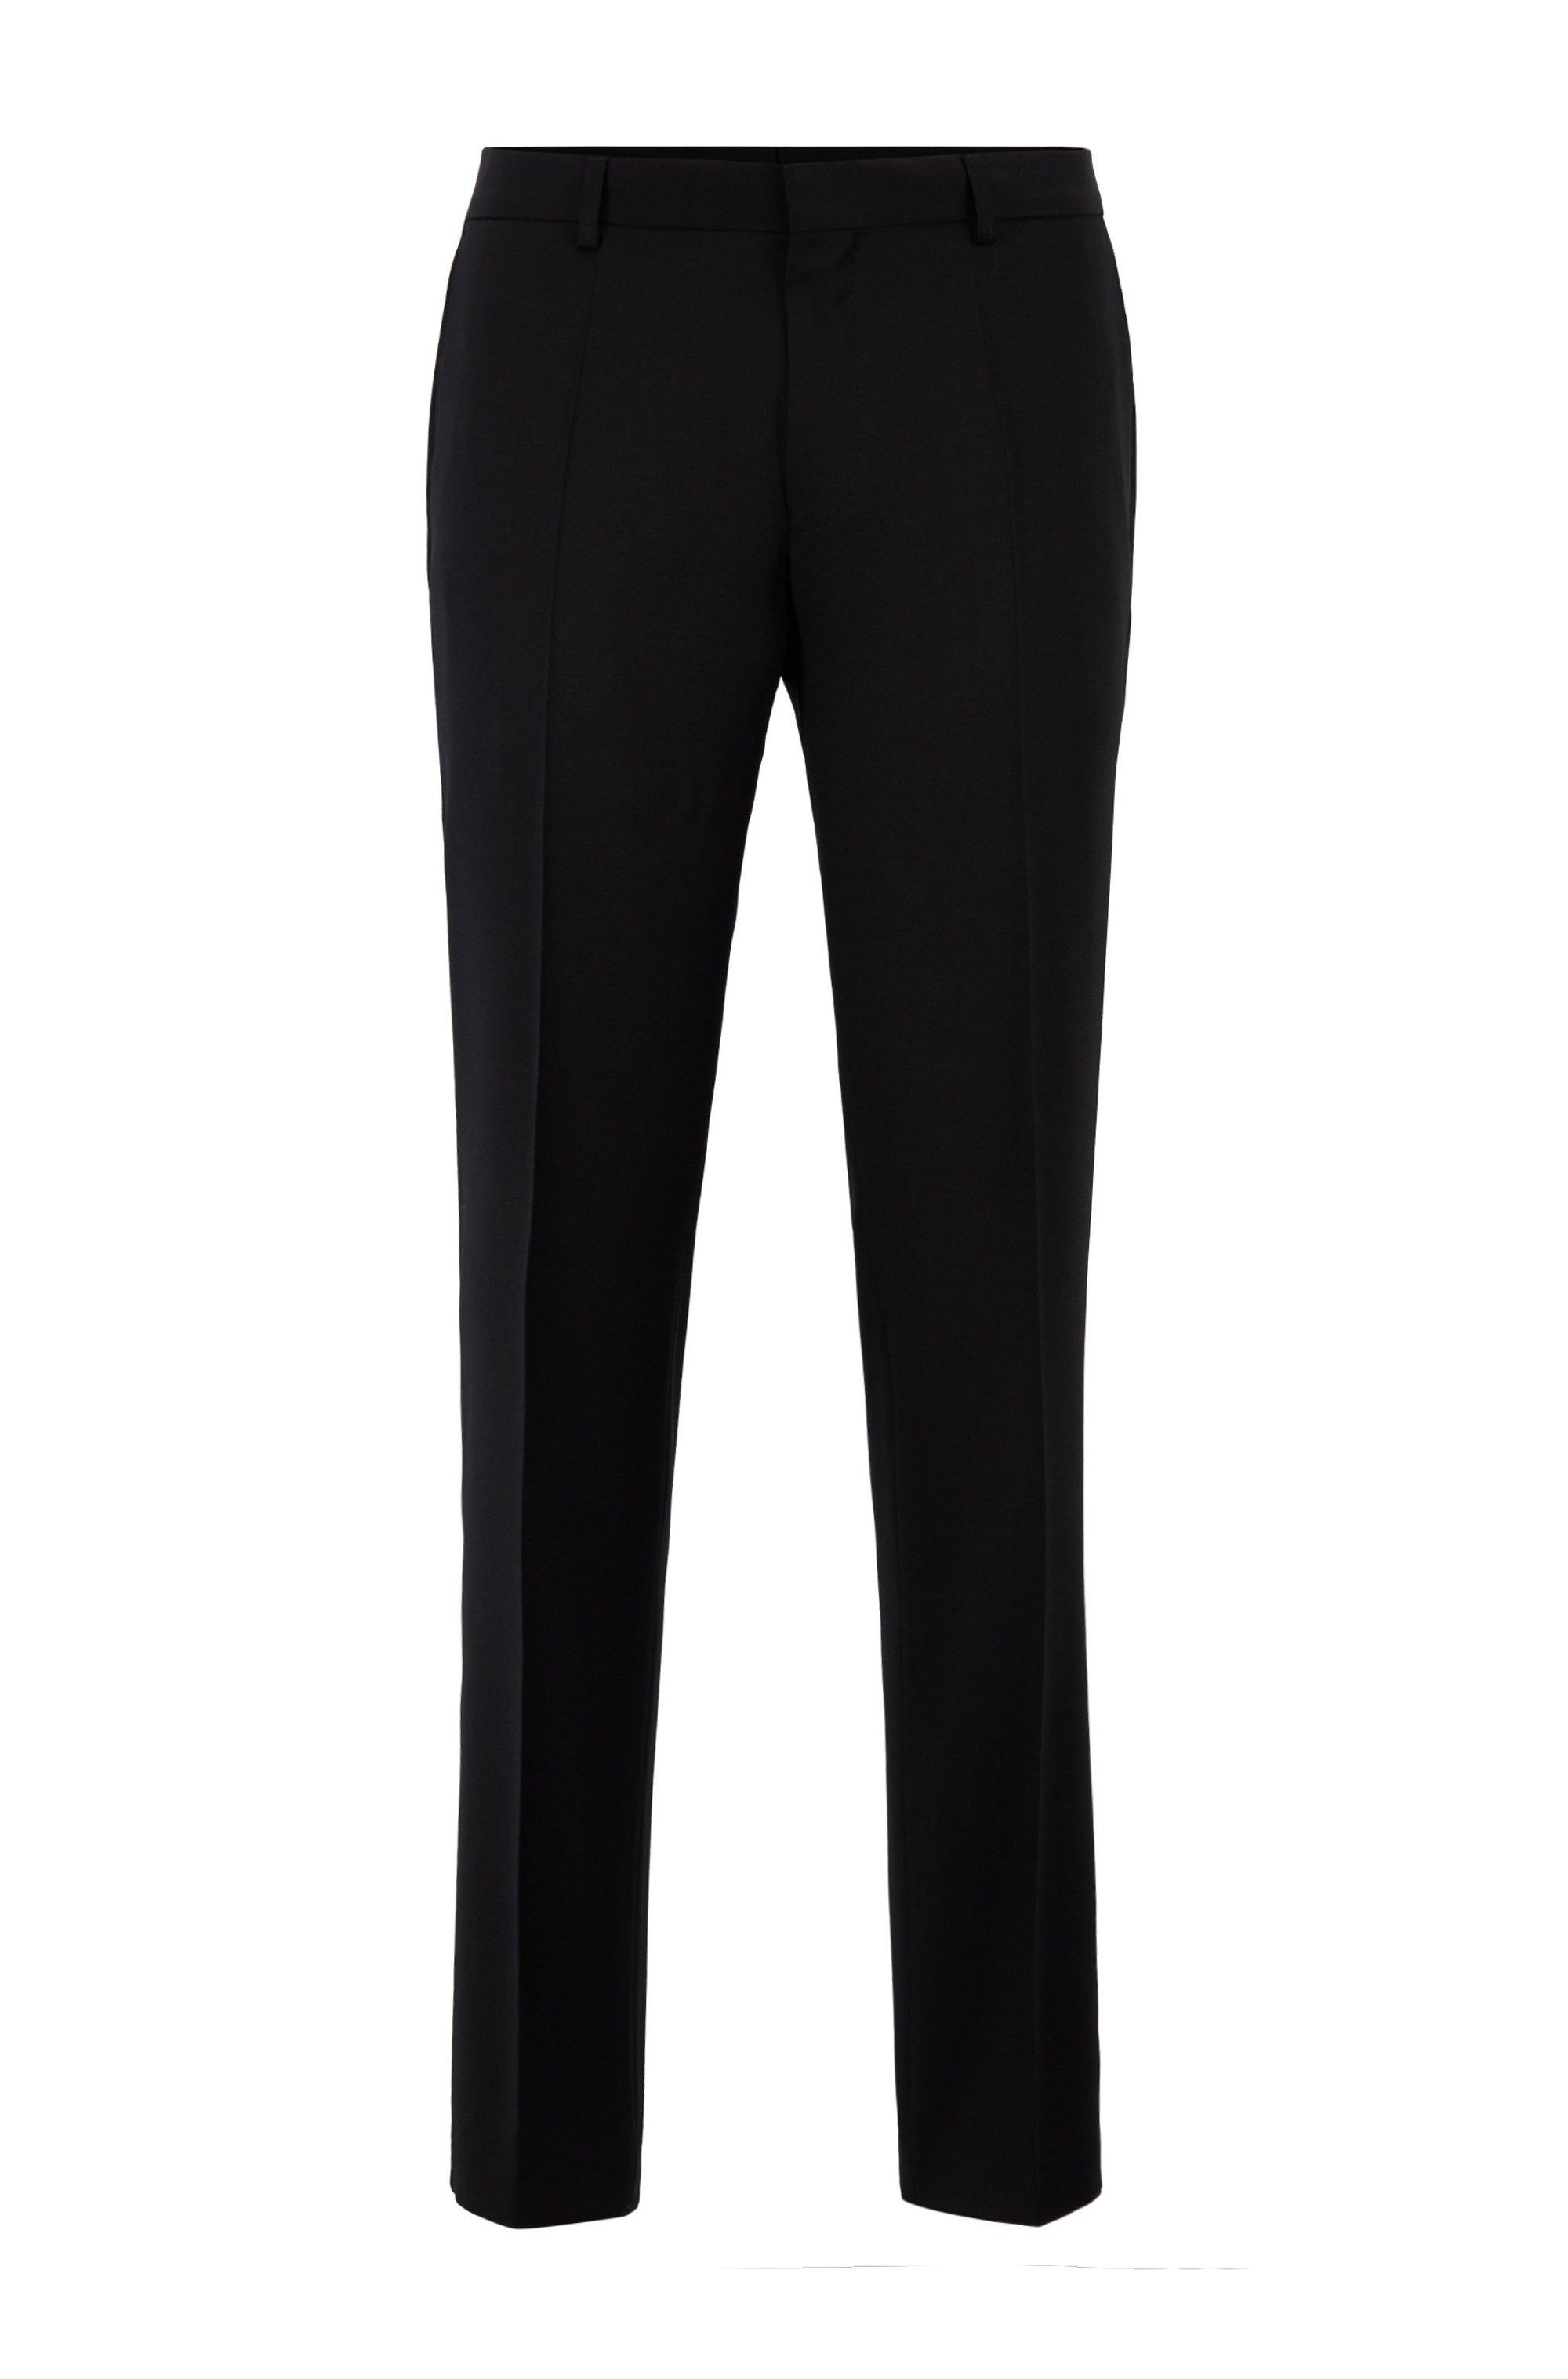 Pantalones slim fit en sarga de lana virgen jaspeada, Negro